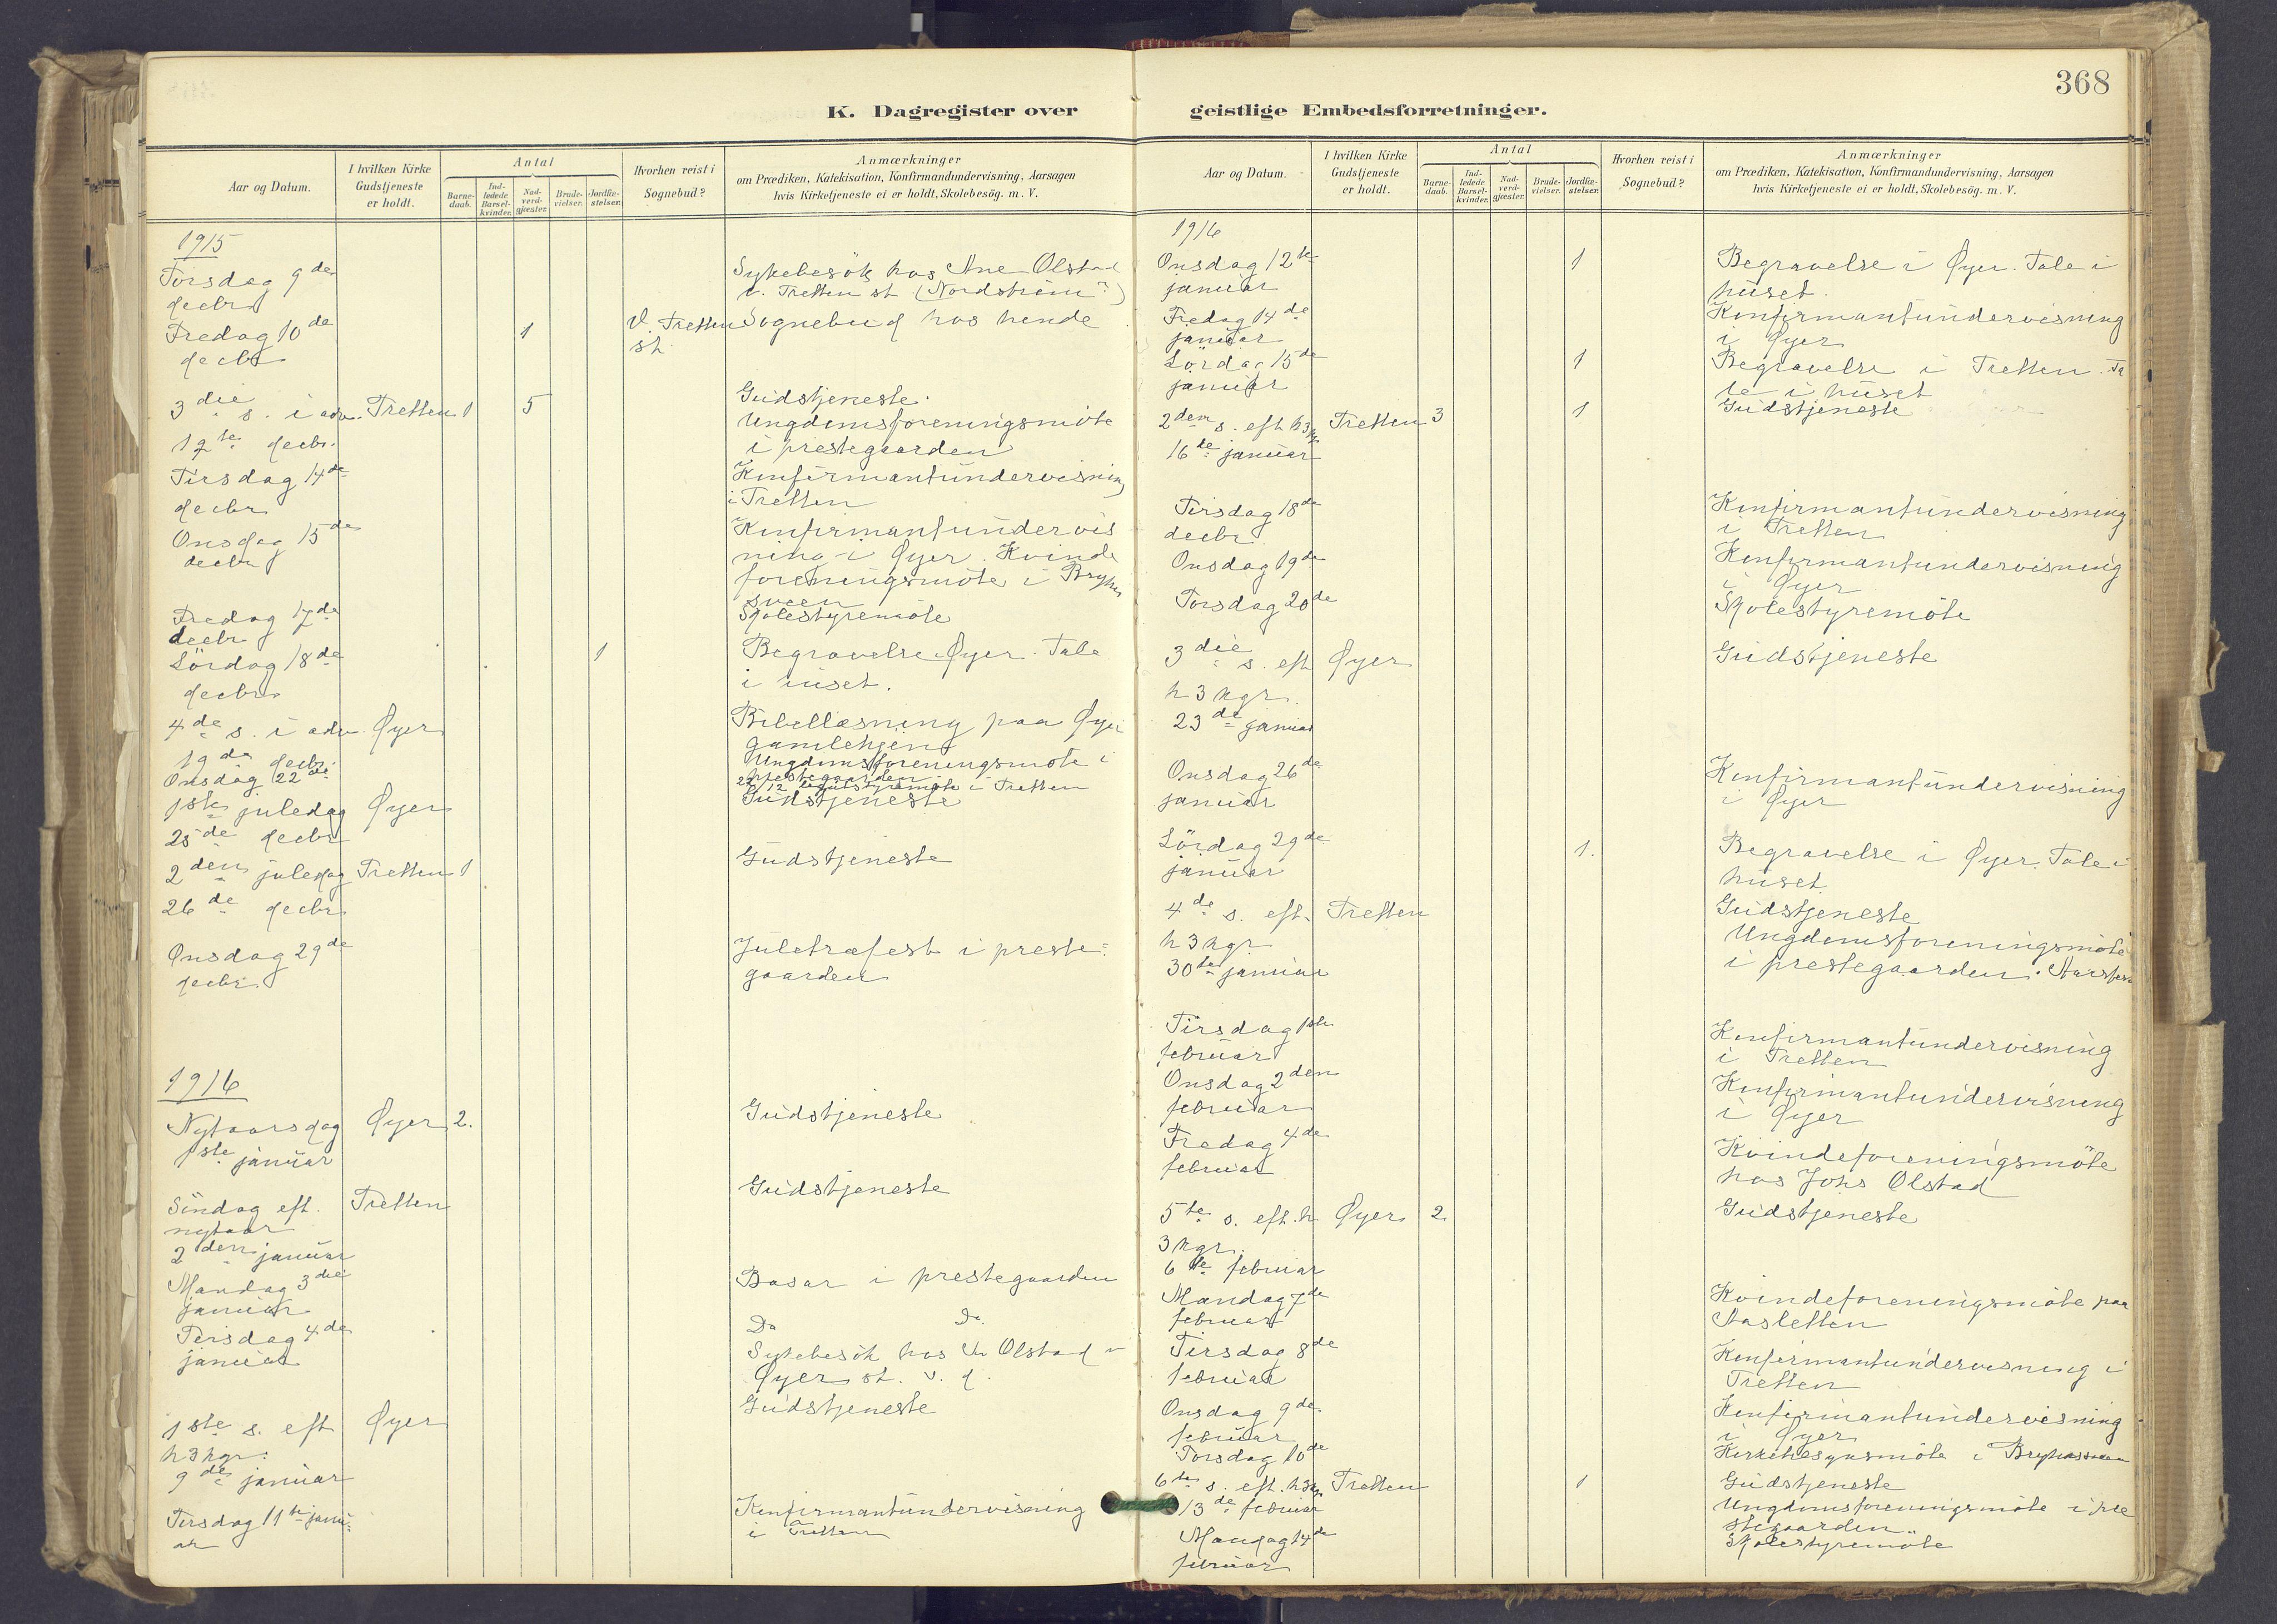 SAH, Øyer prestekontor, Ministerialbok nr. 12, 1897-1920, s. 368